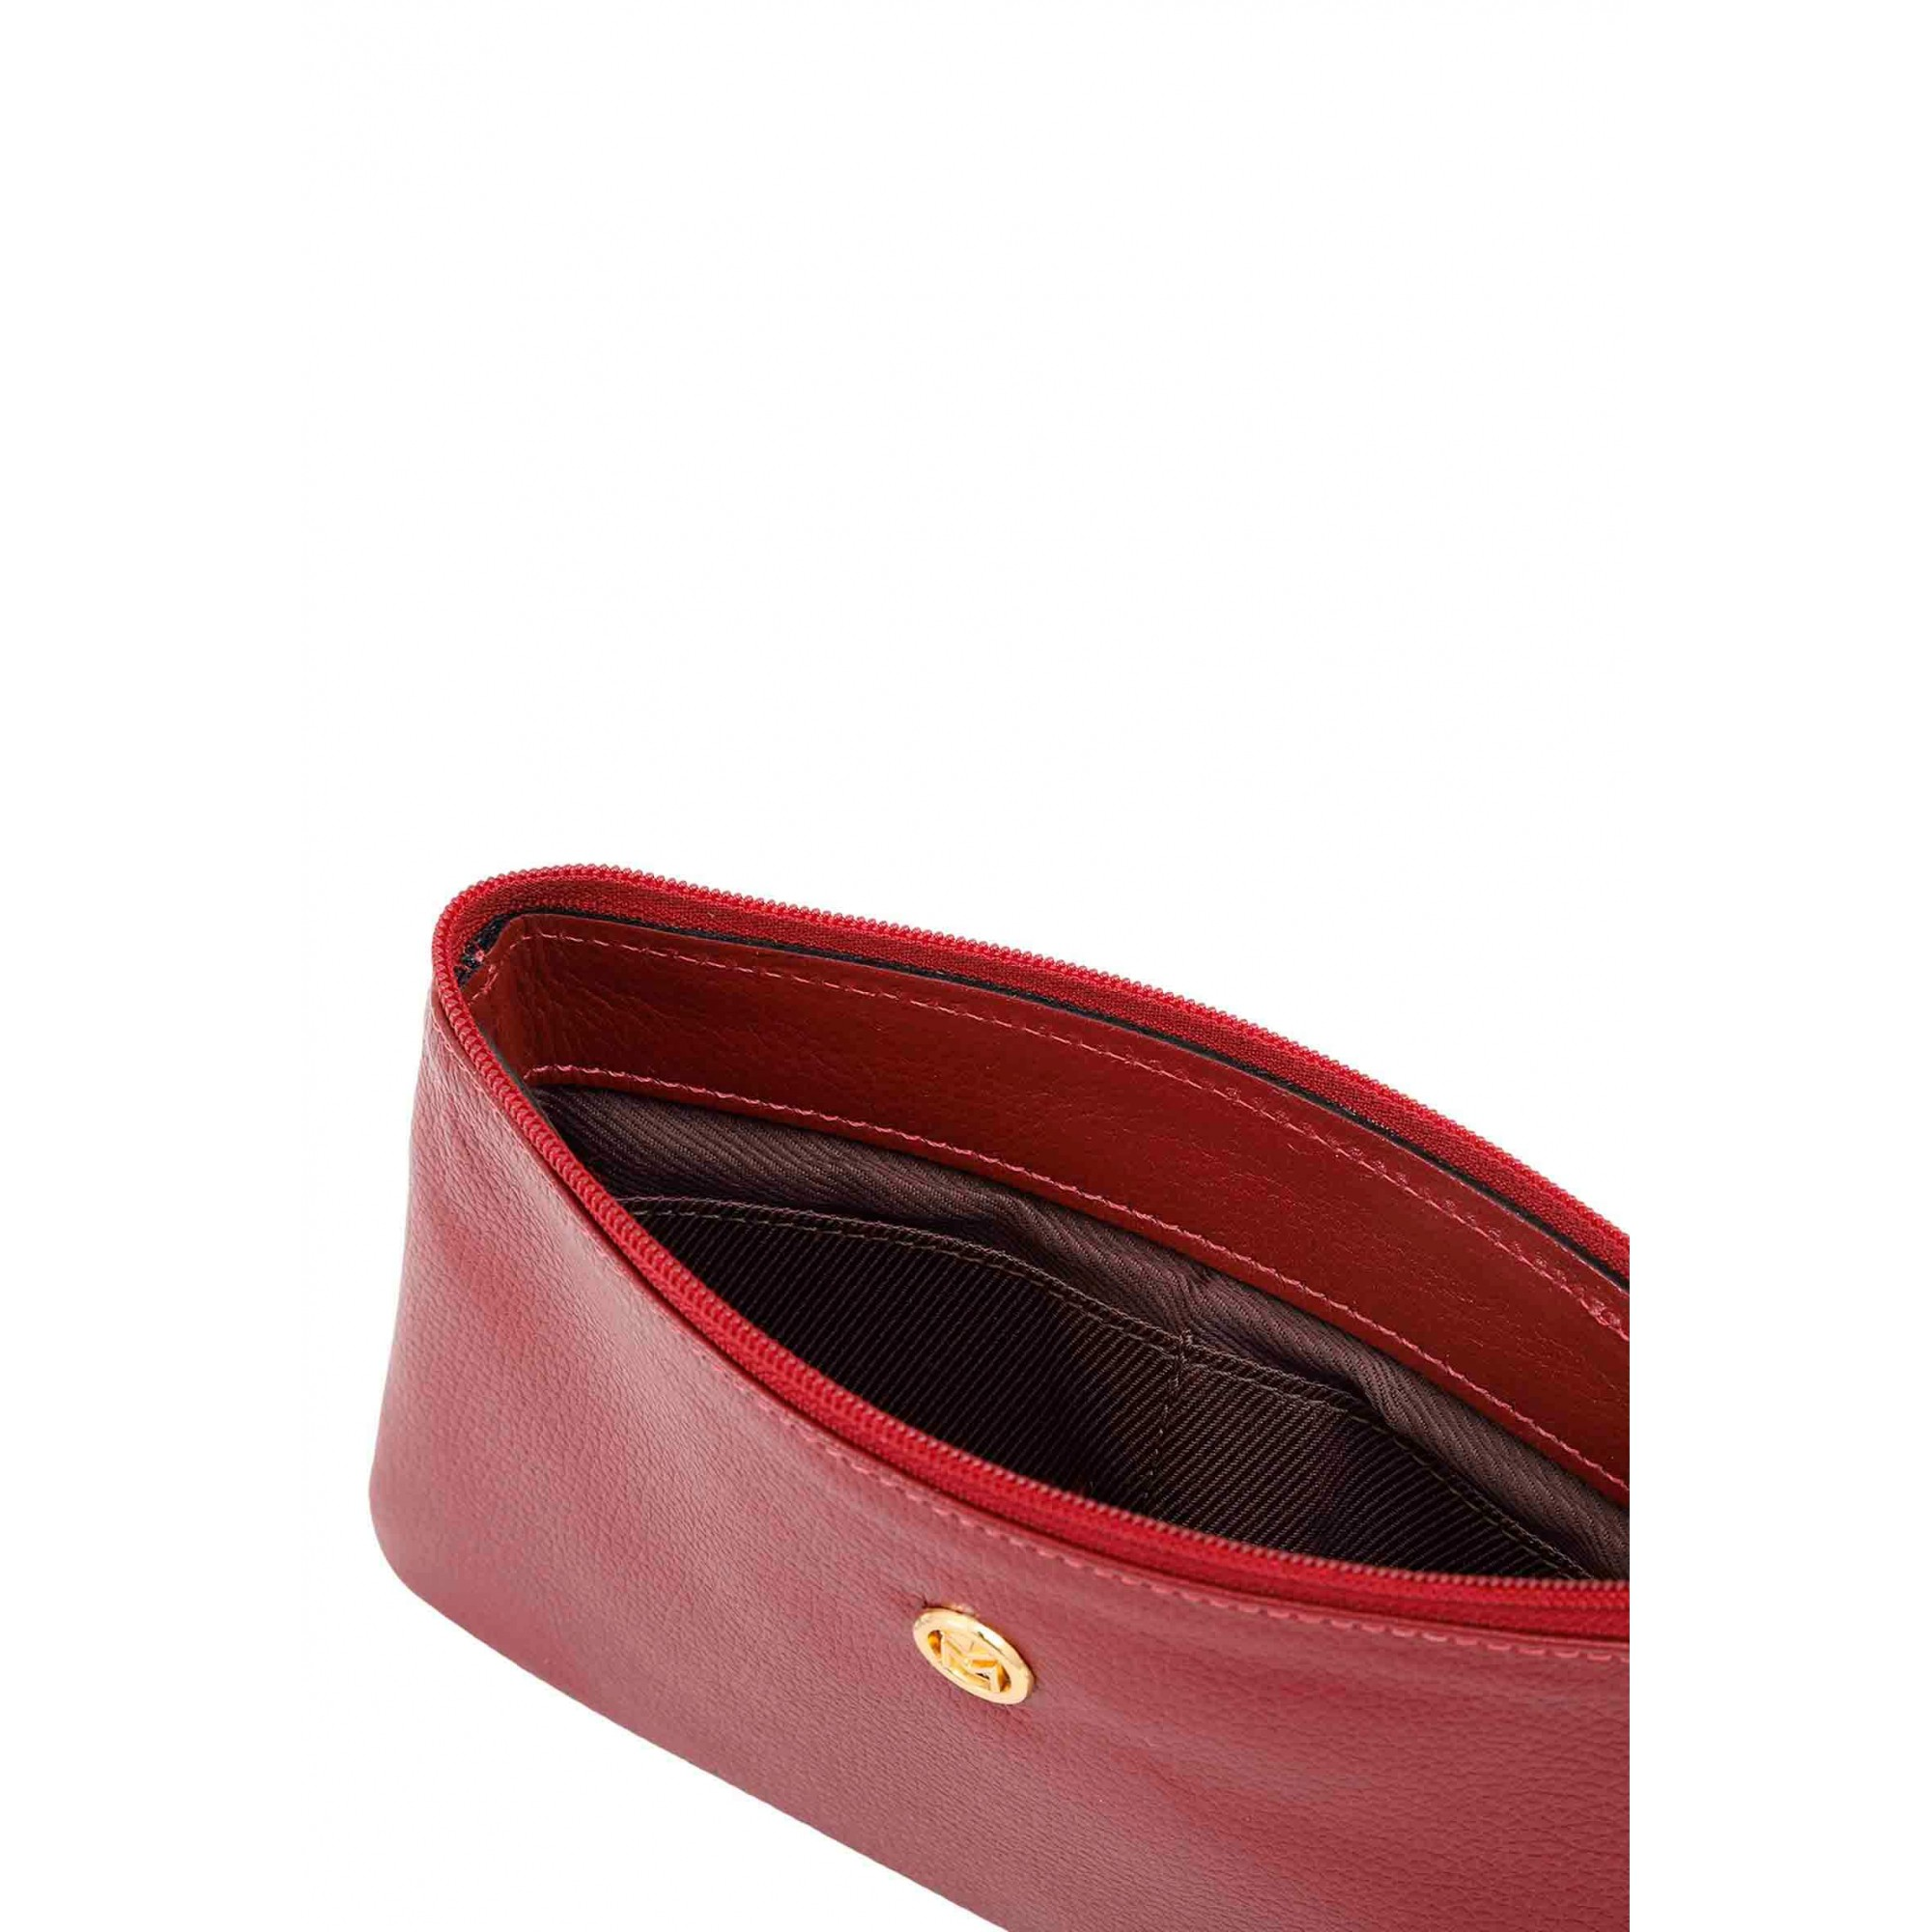 Bolsa Carteira Clutch Couro Mariart 262